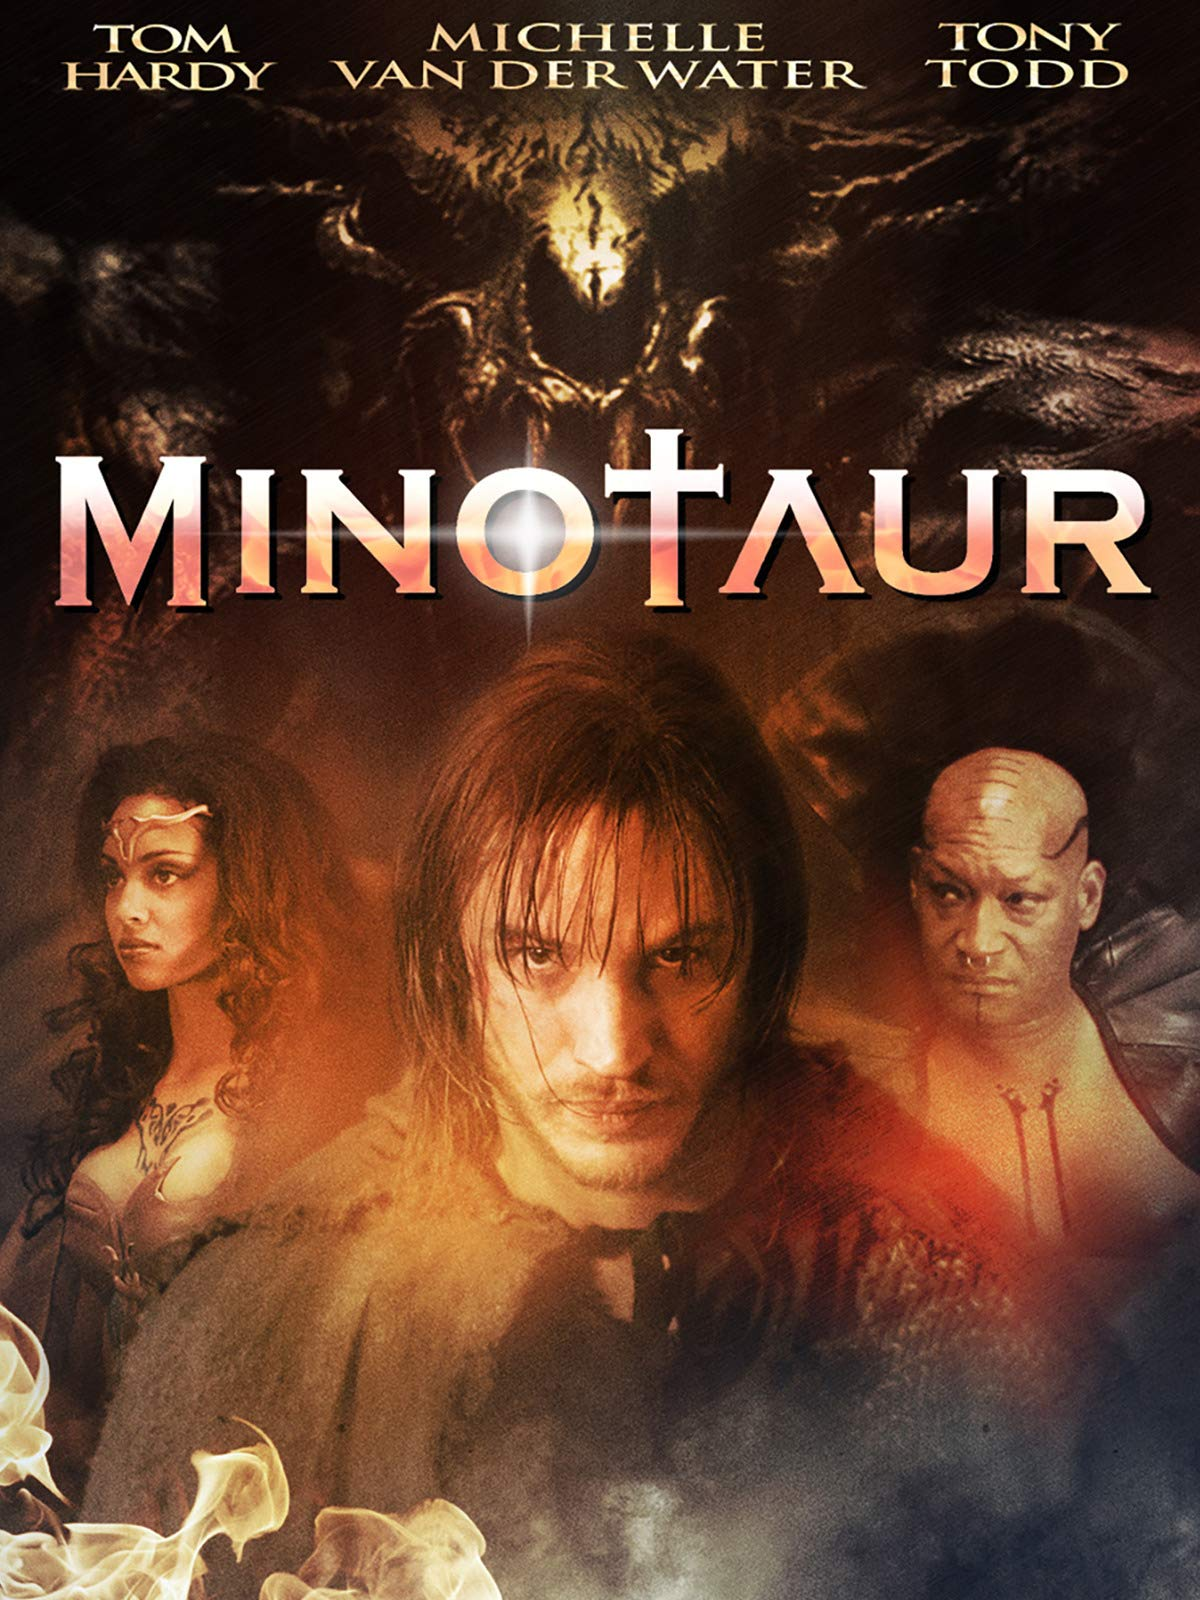 Minotaur (2006) Hindi Dubbed